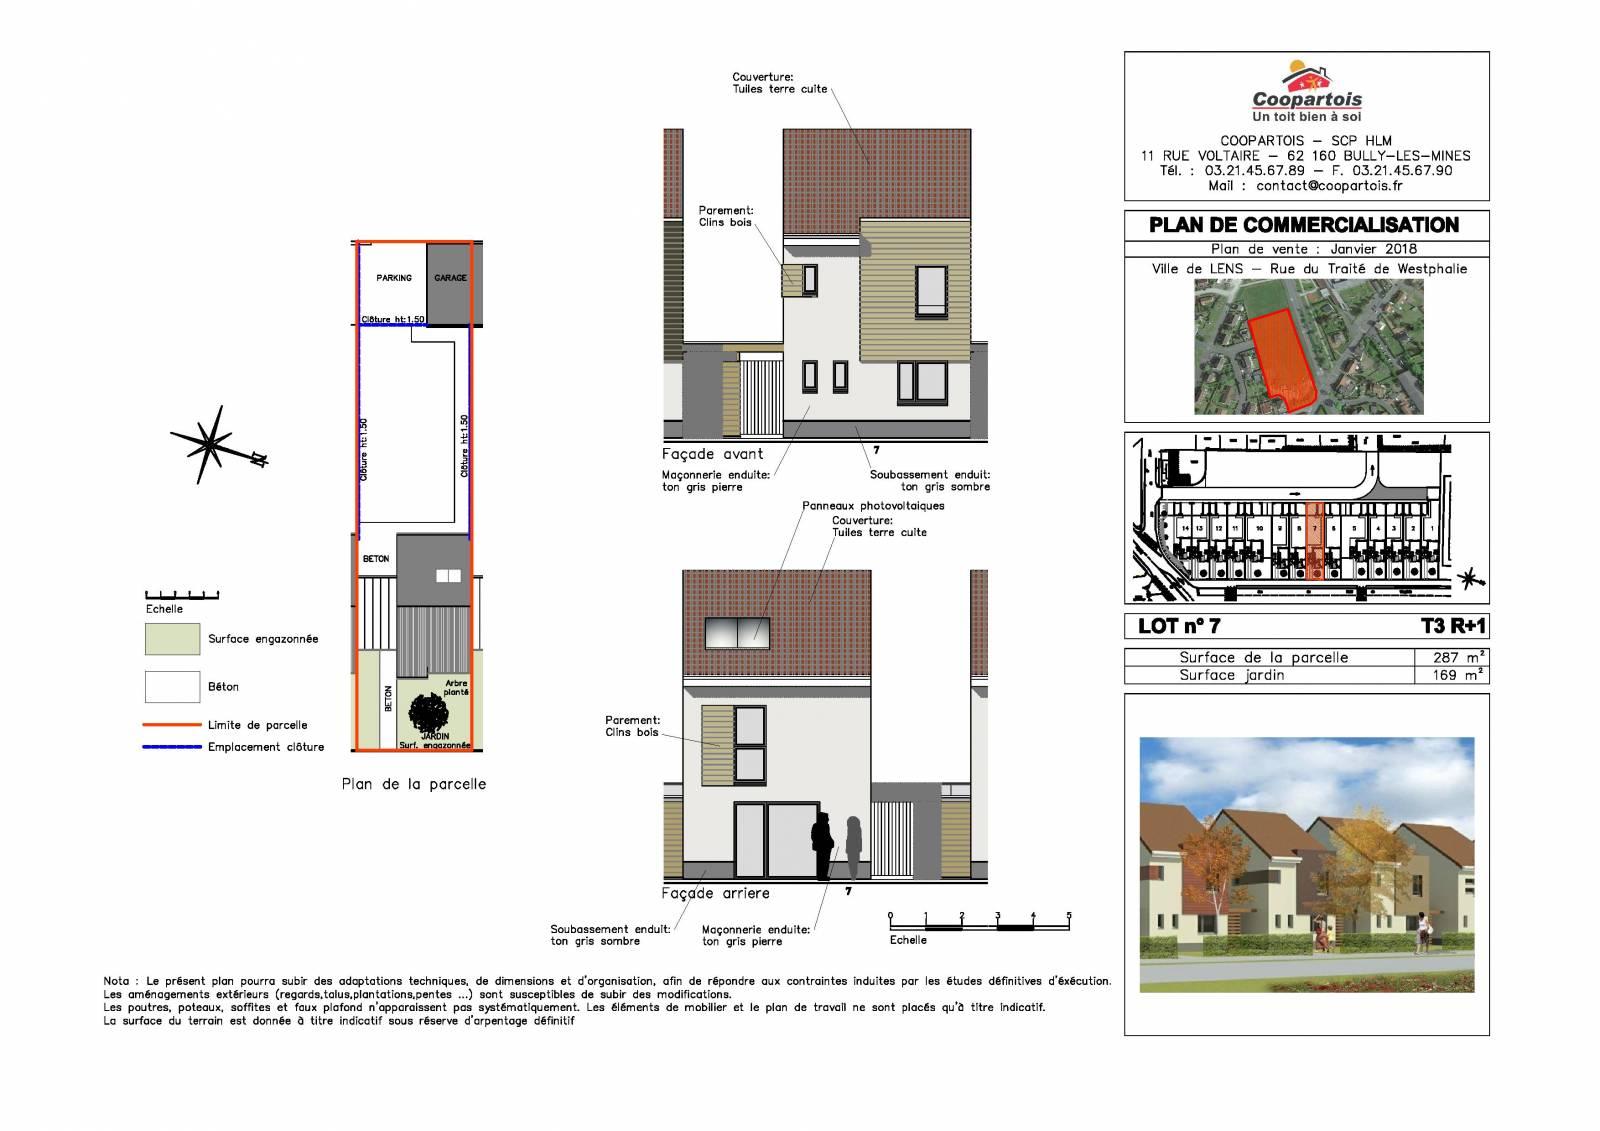 Maison neuve 2 chambres etage n 7 coopartois for Plan maison 7 chambres